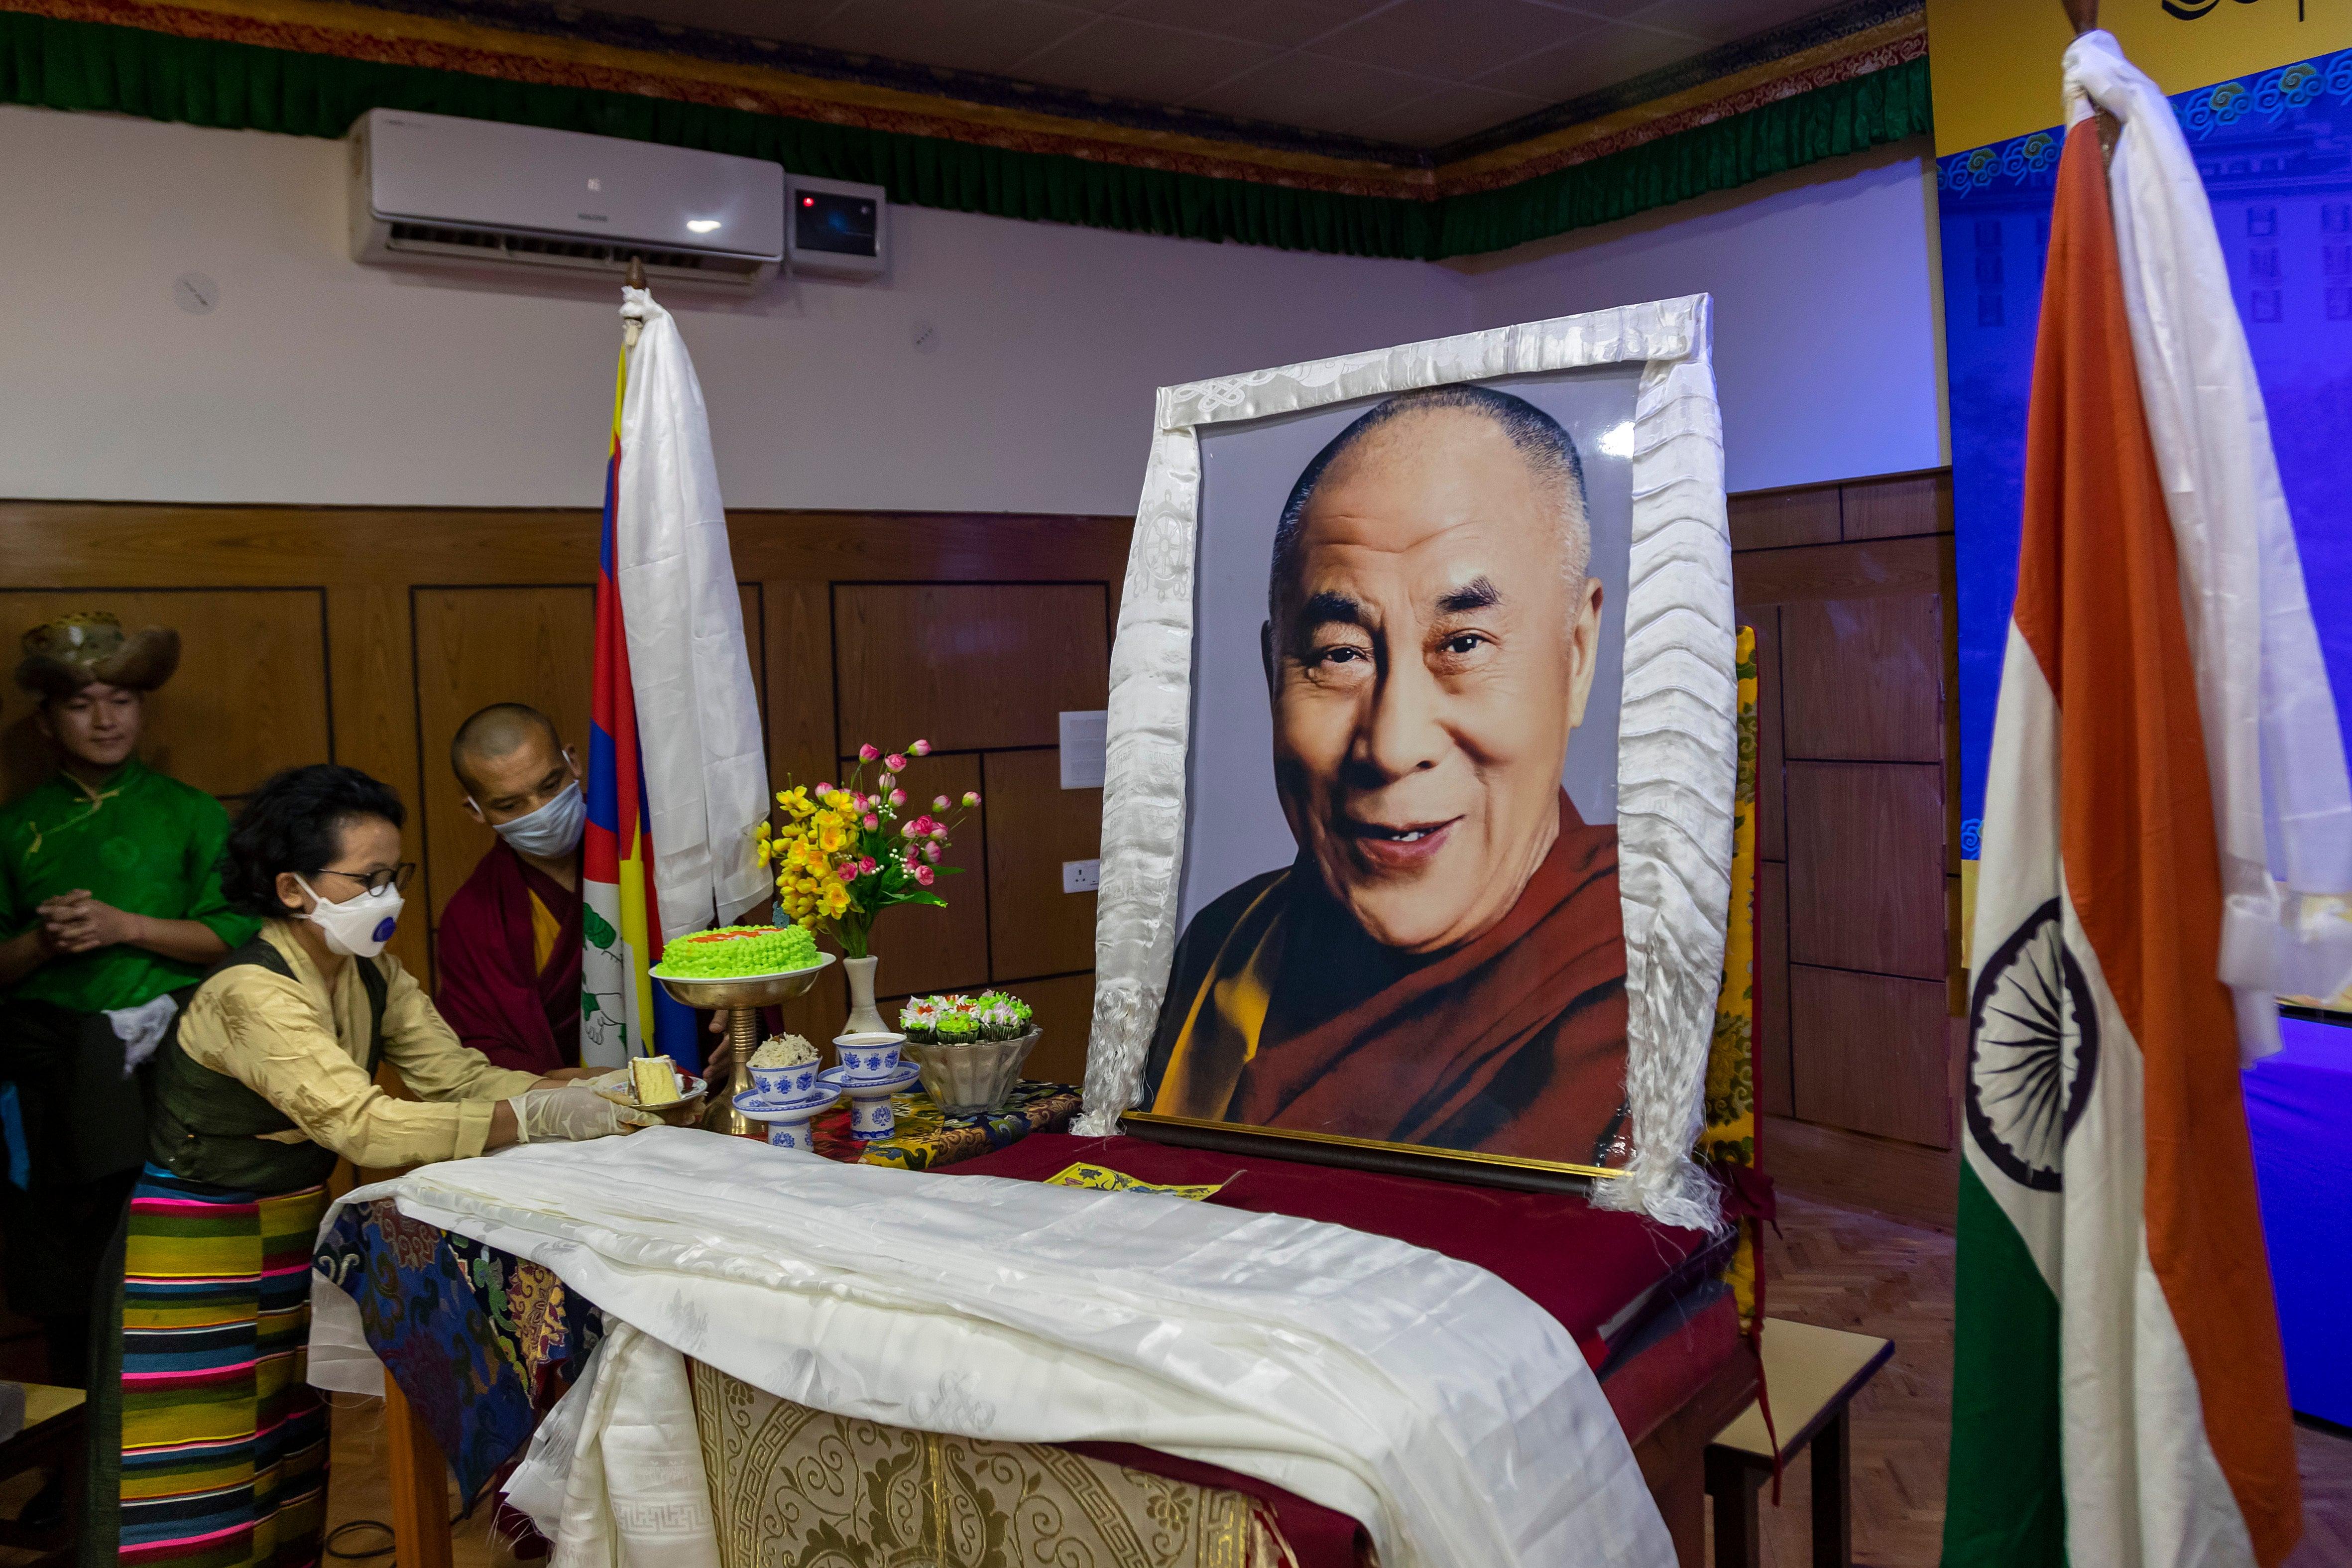 Dalai Lama marks 85th birthday with new album, message on climate change, coronavirus pandemic